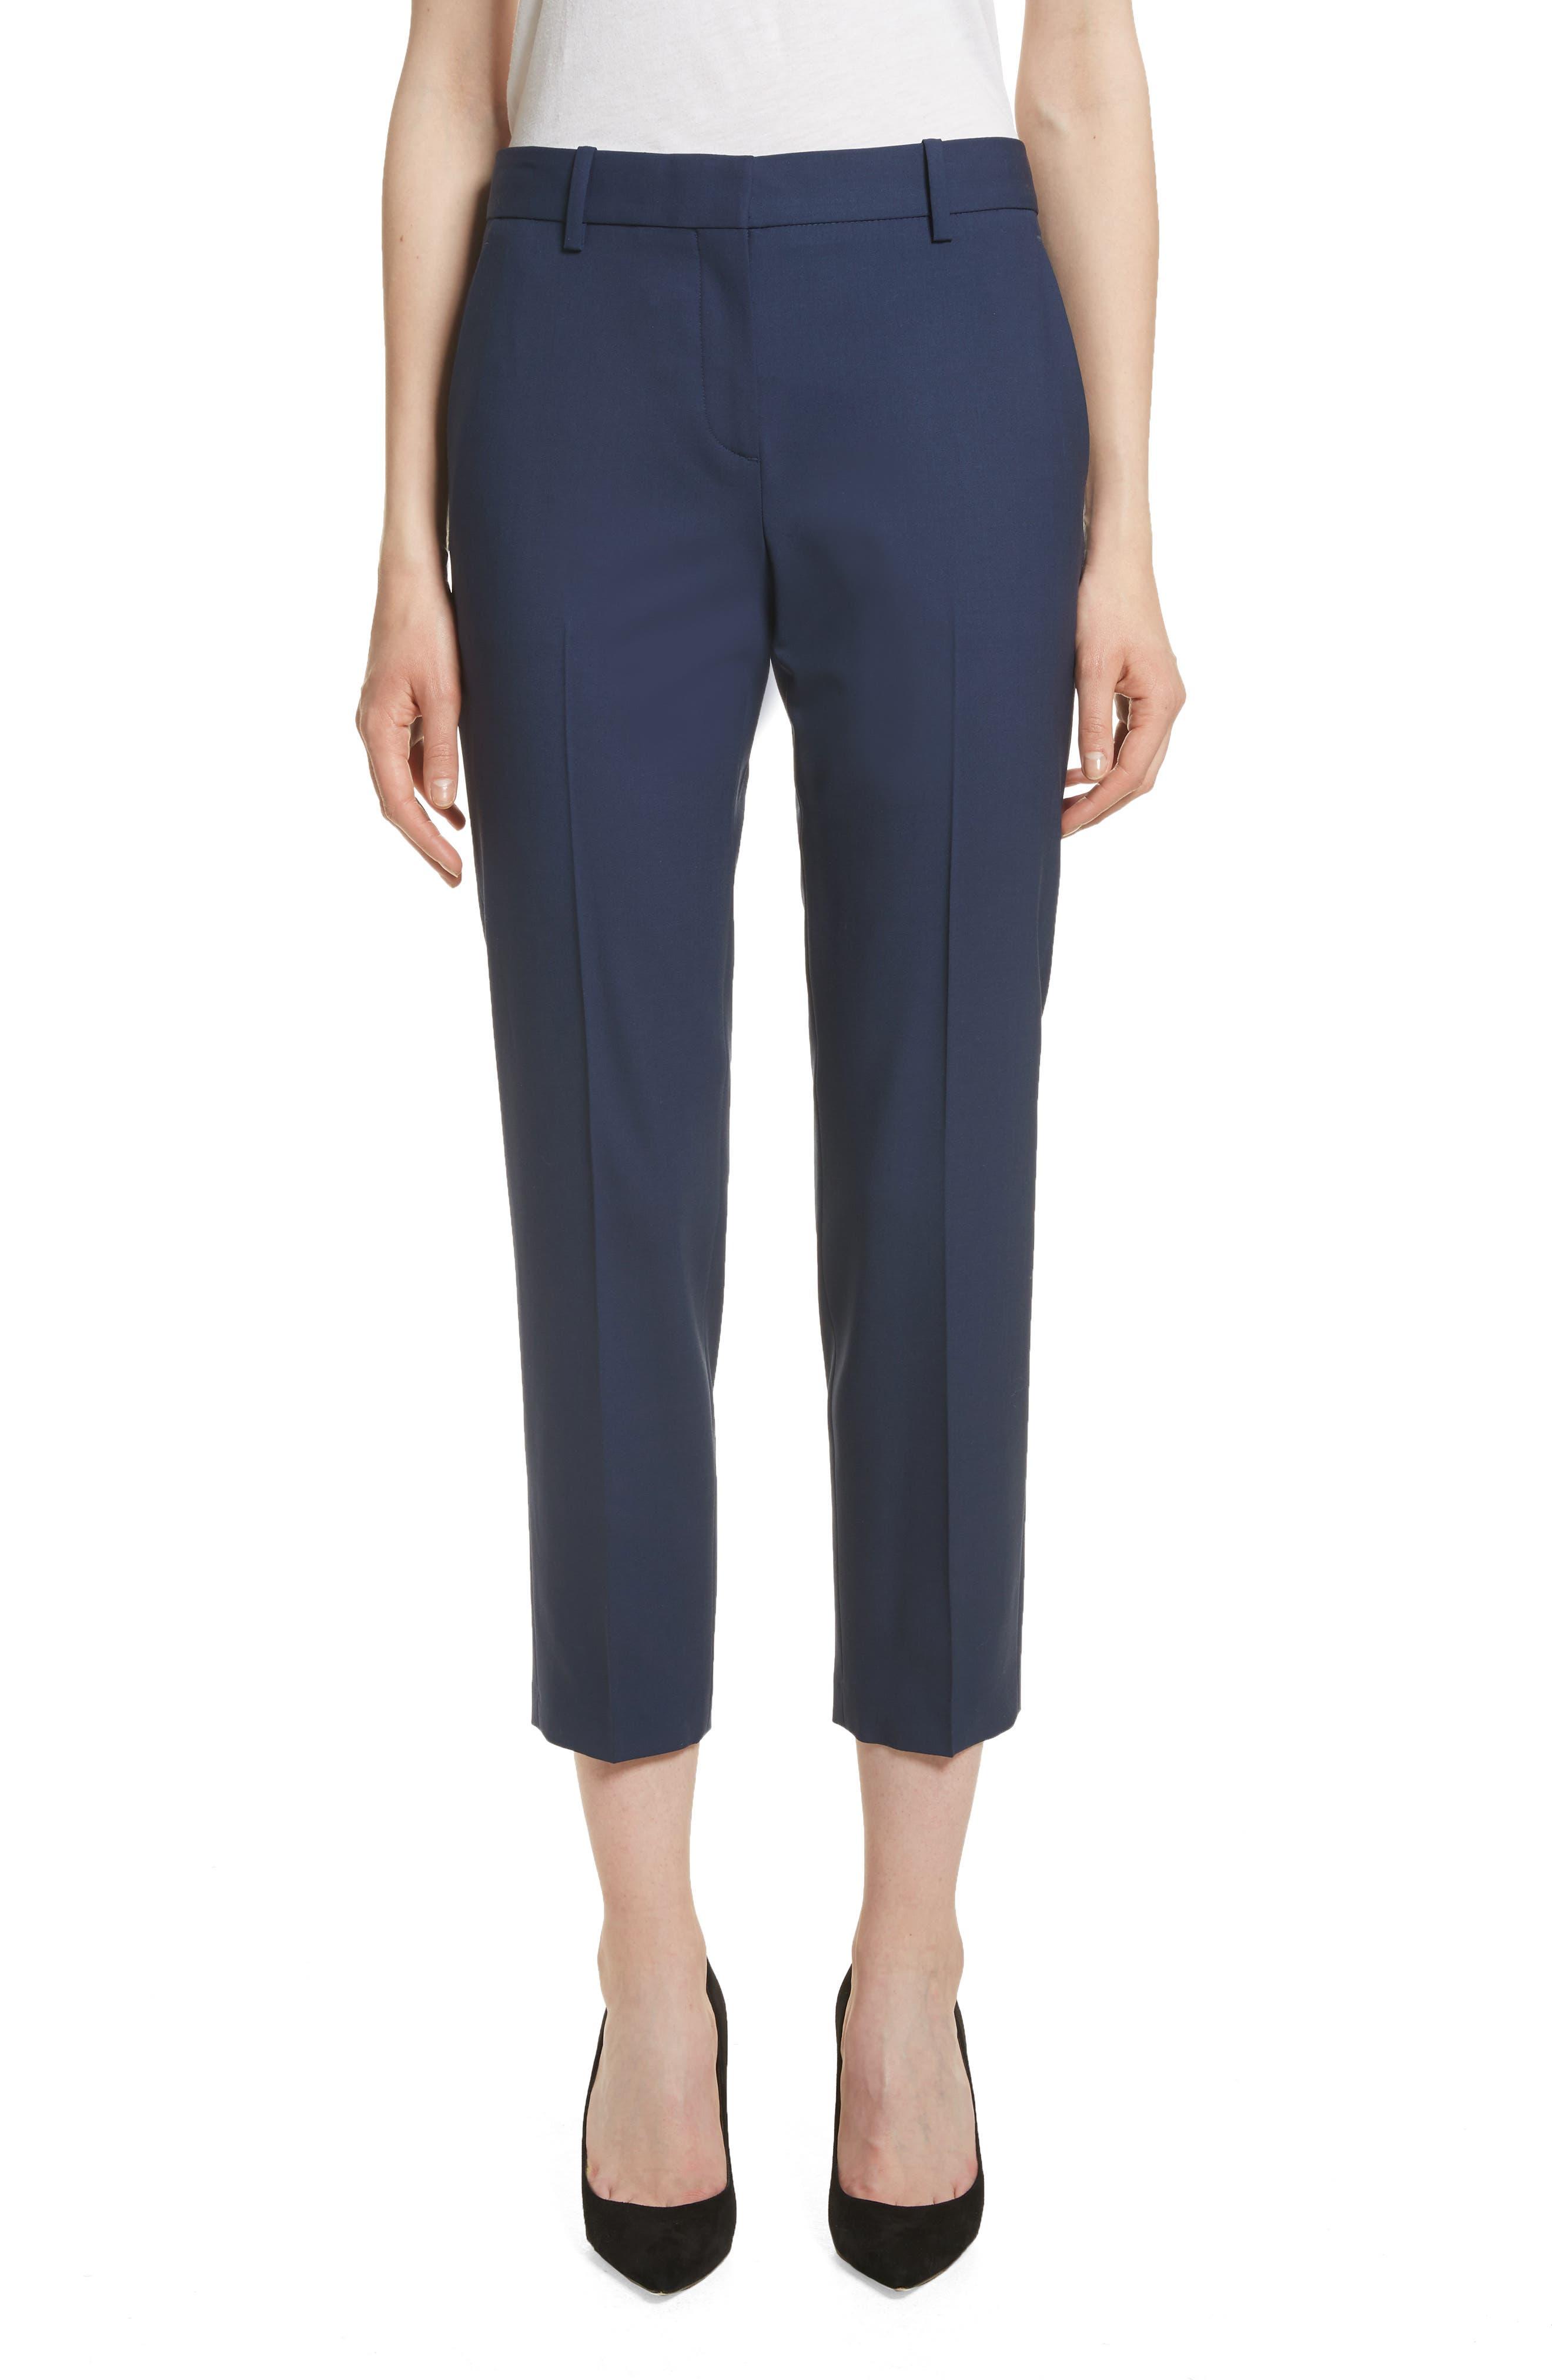 Treeca 2 Good Wool Crop Suit Pants,                             Main thumbnail 1, color,                             Sea Blue